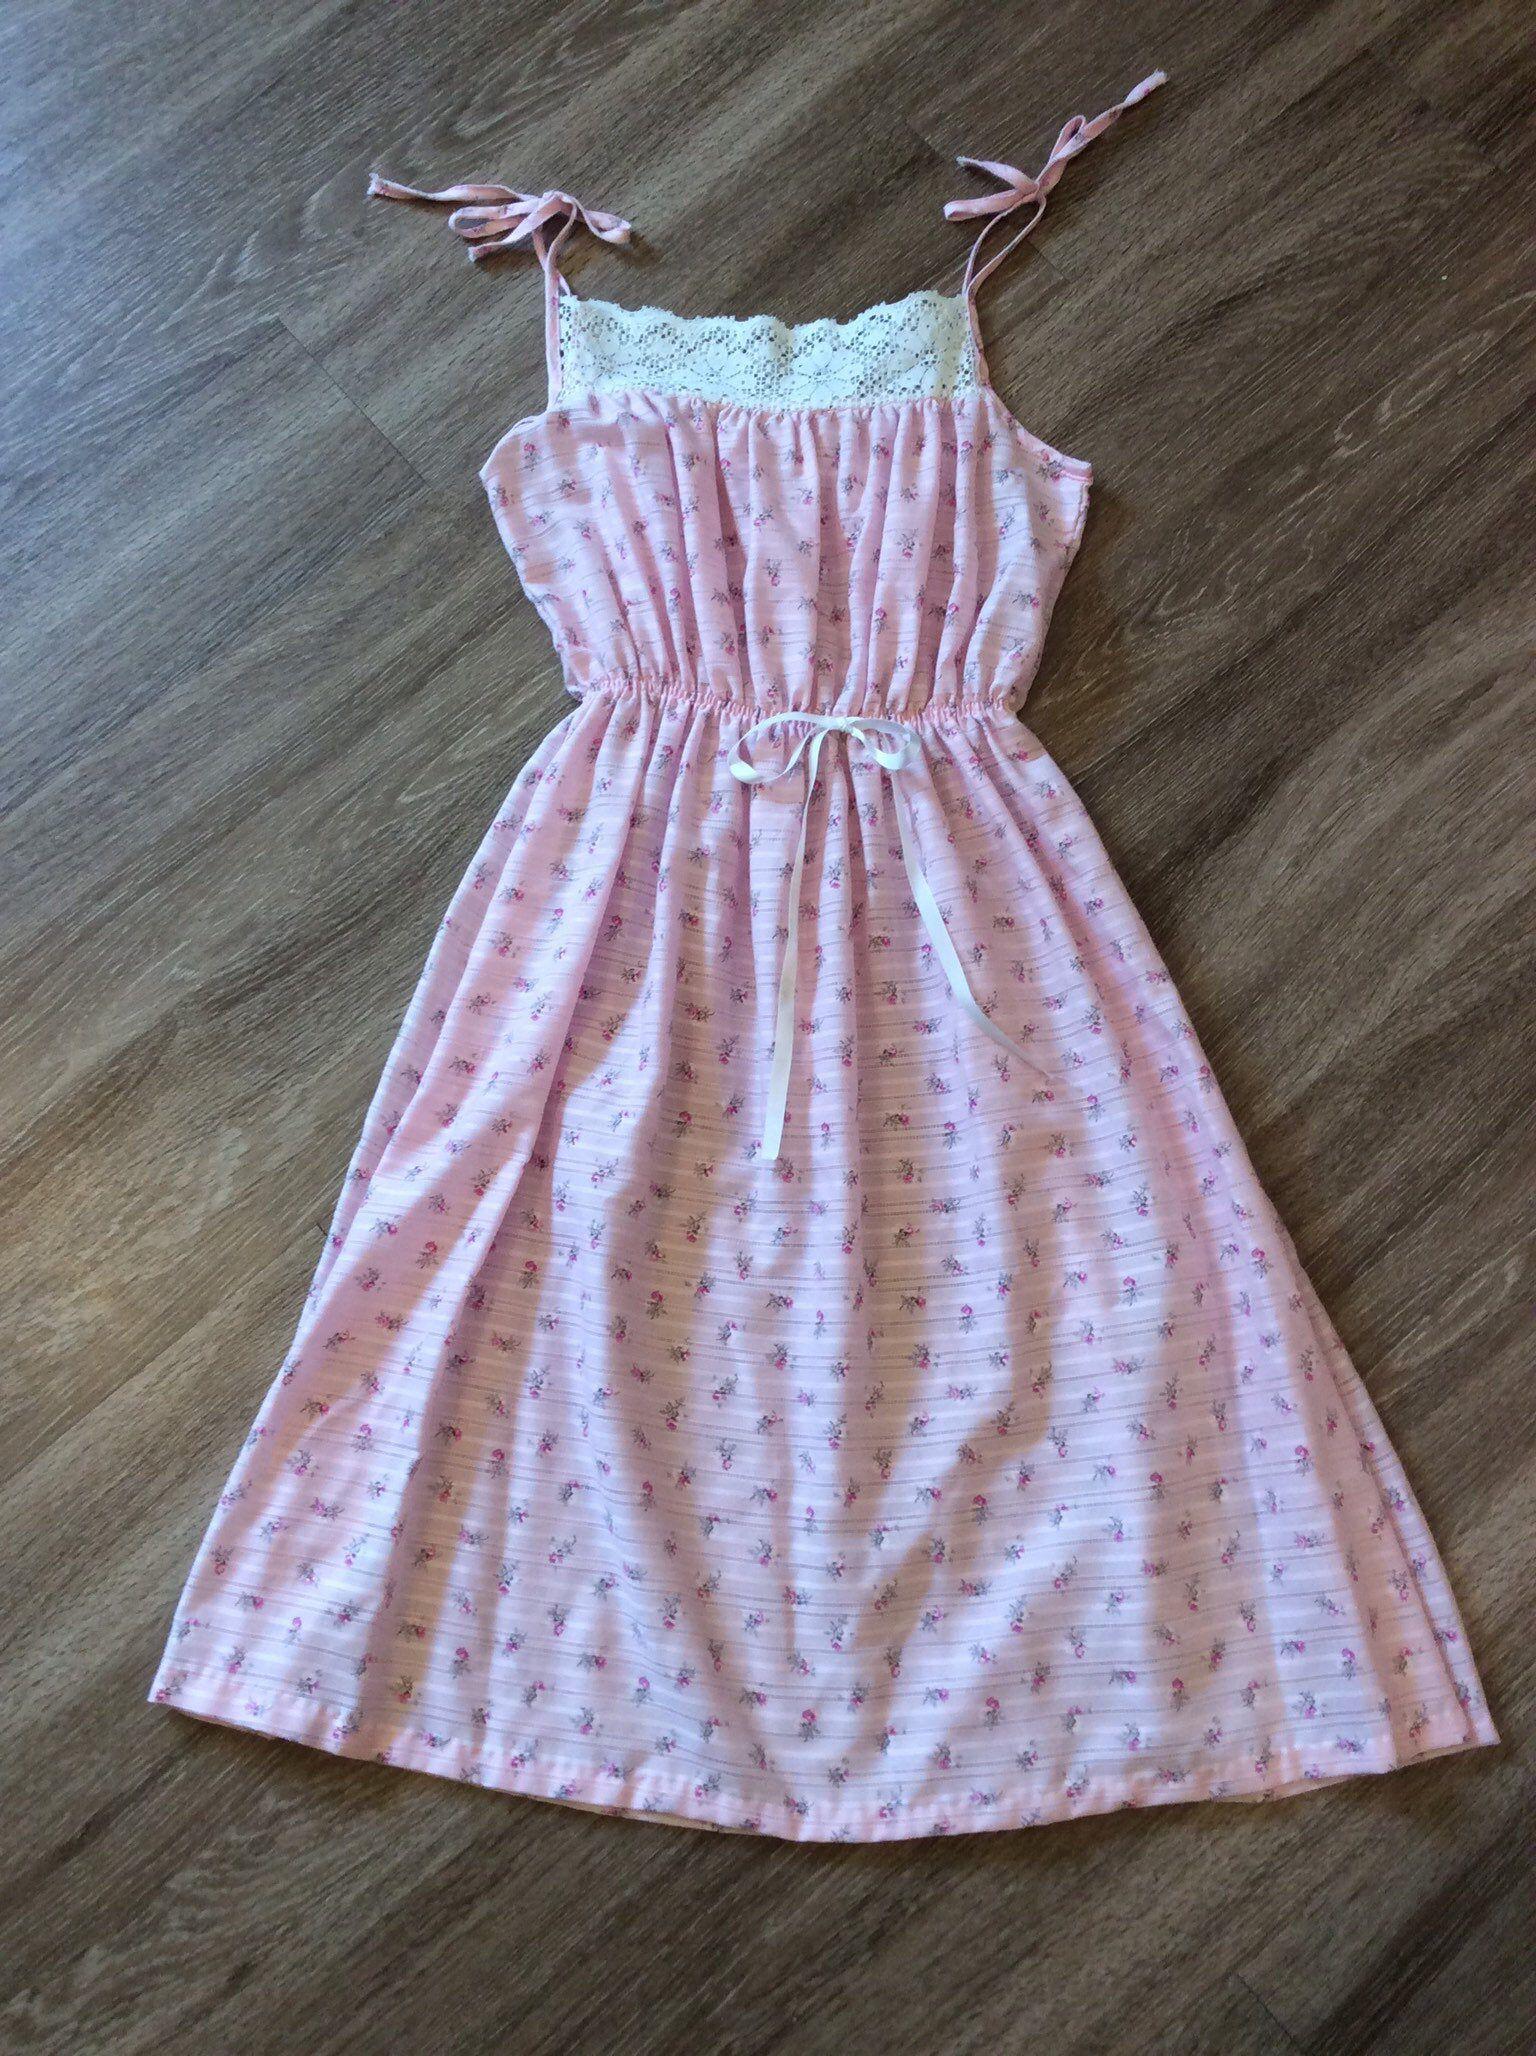 Vintage 70s Sundress Boho Hippie Summer Dress Midi Bohemian Etsy Vintage Summer Fashion Vintage Summer Dresses Midi Dress Summer [ 2056 x 1536 Pixel ]